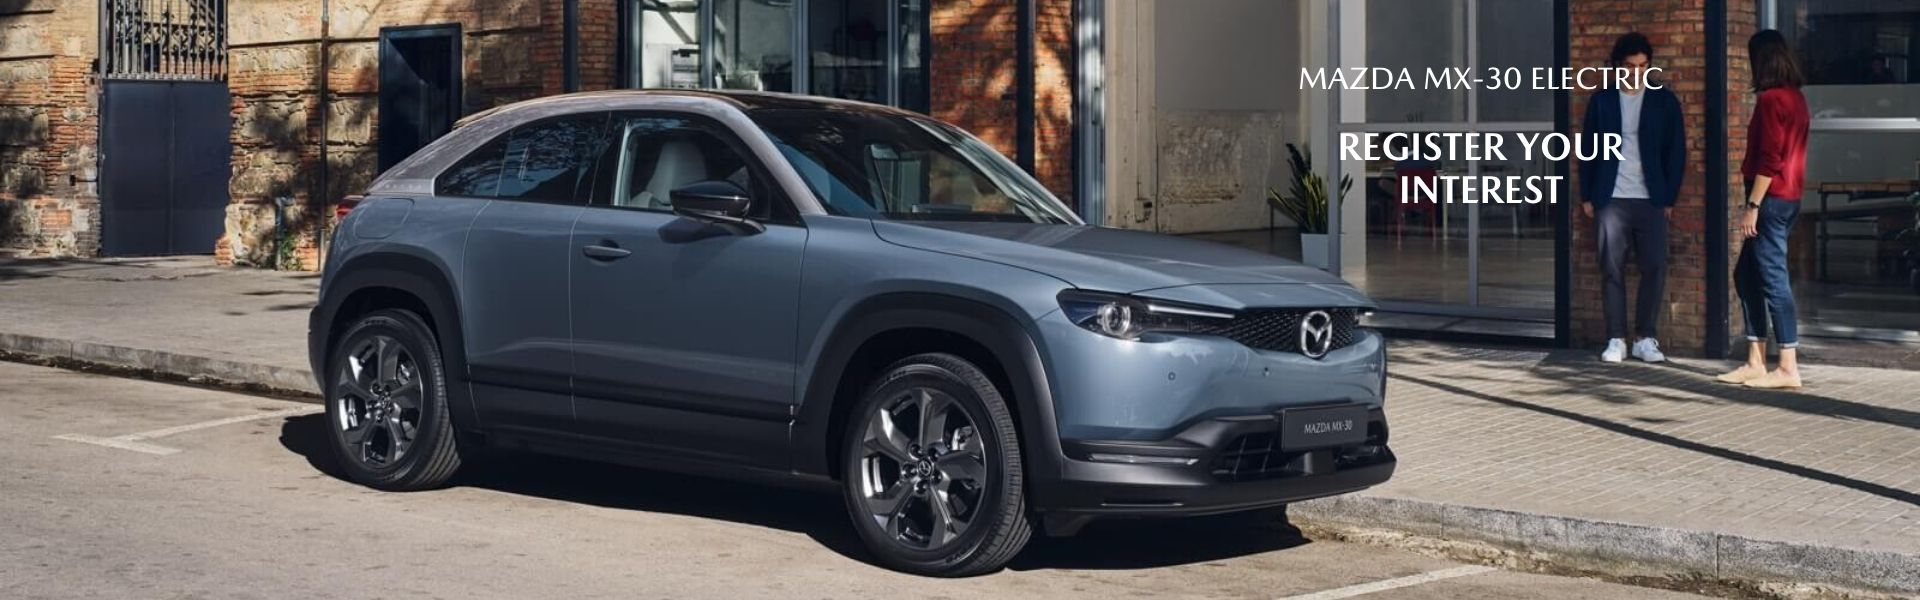 Mazda MX-30 Electric. Register Your Interest.